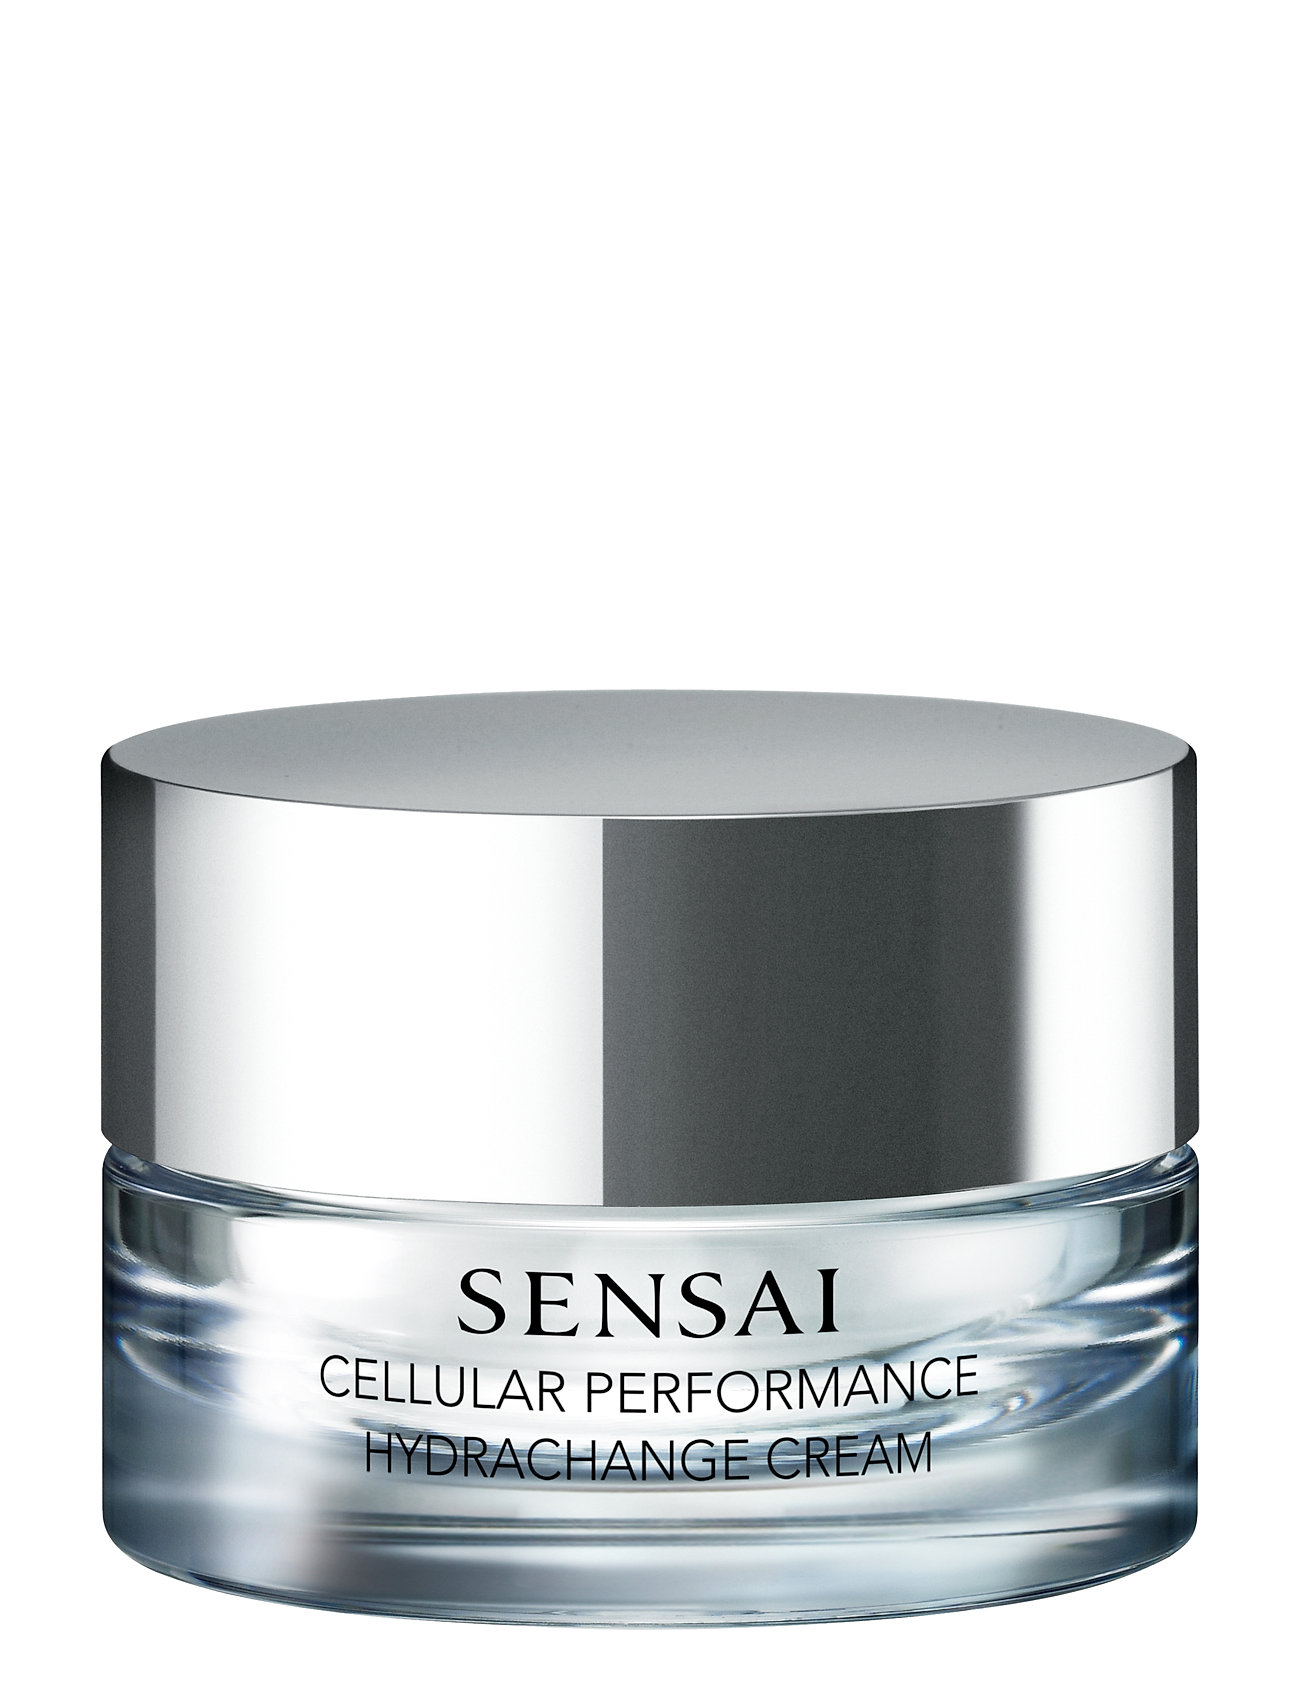 SENSAI Cellular Performance Hydrachange Cream - NO COLOR